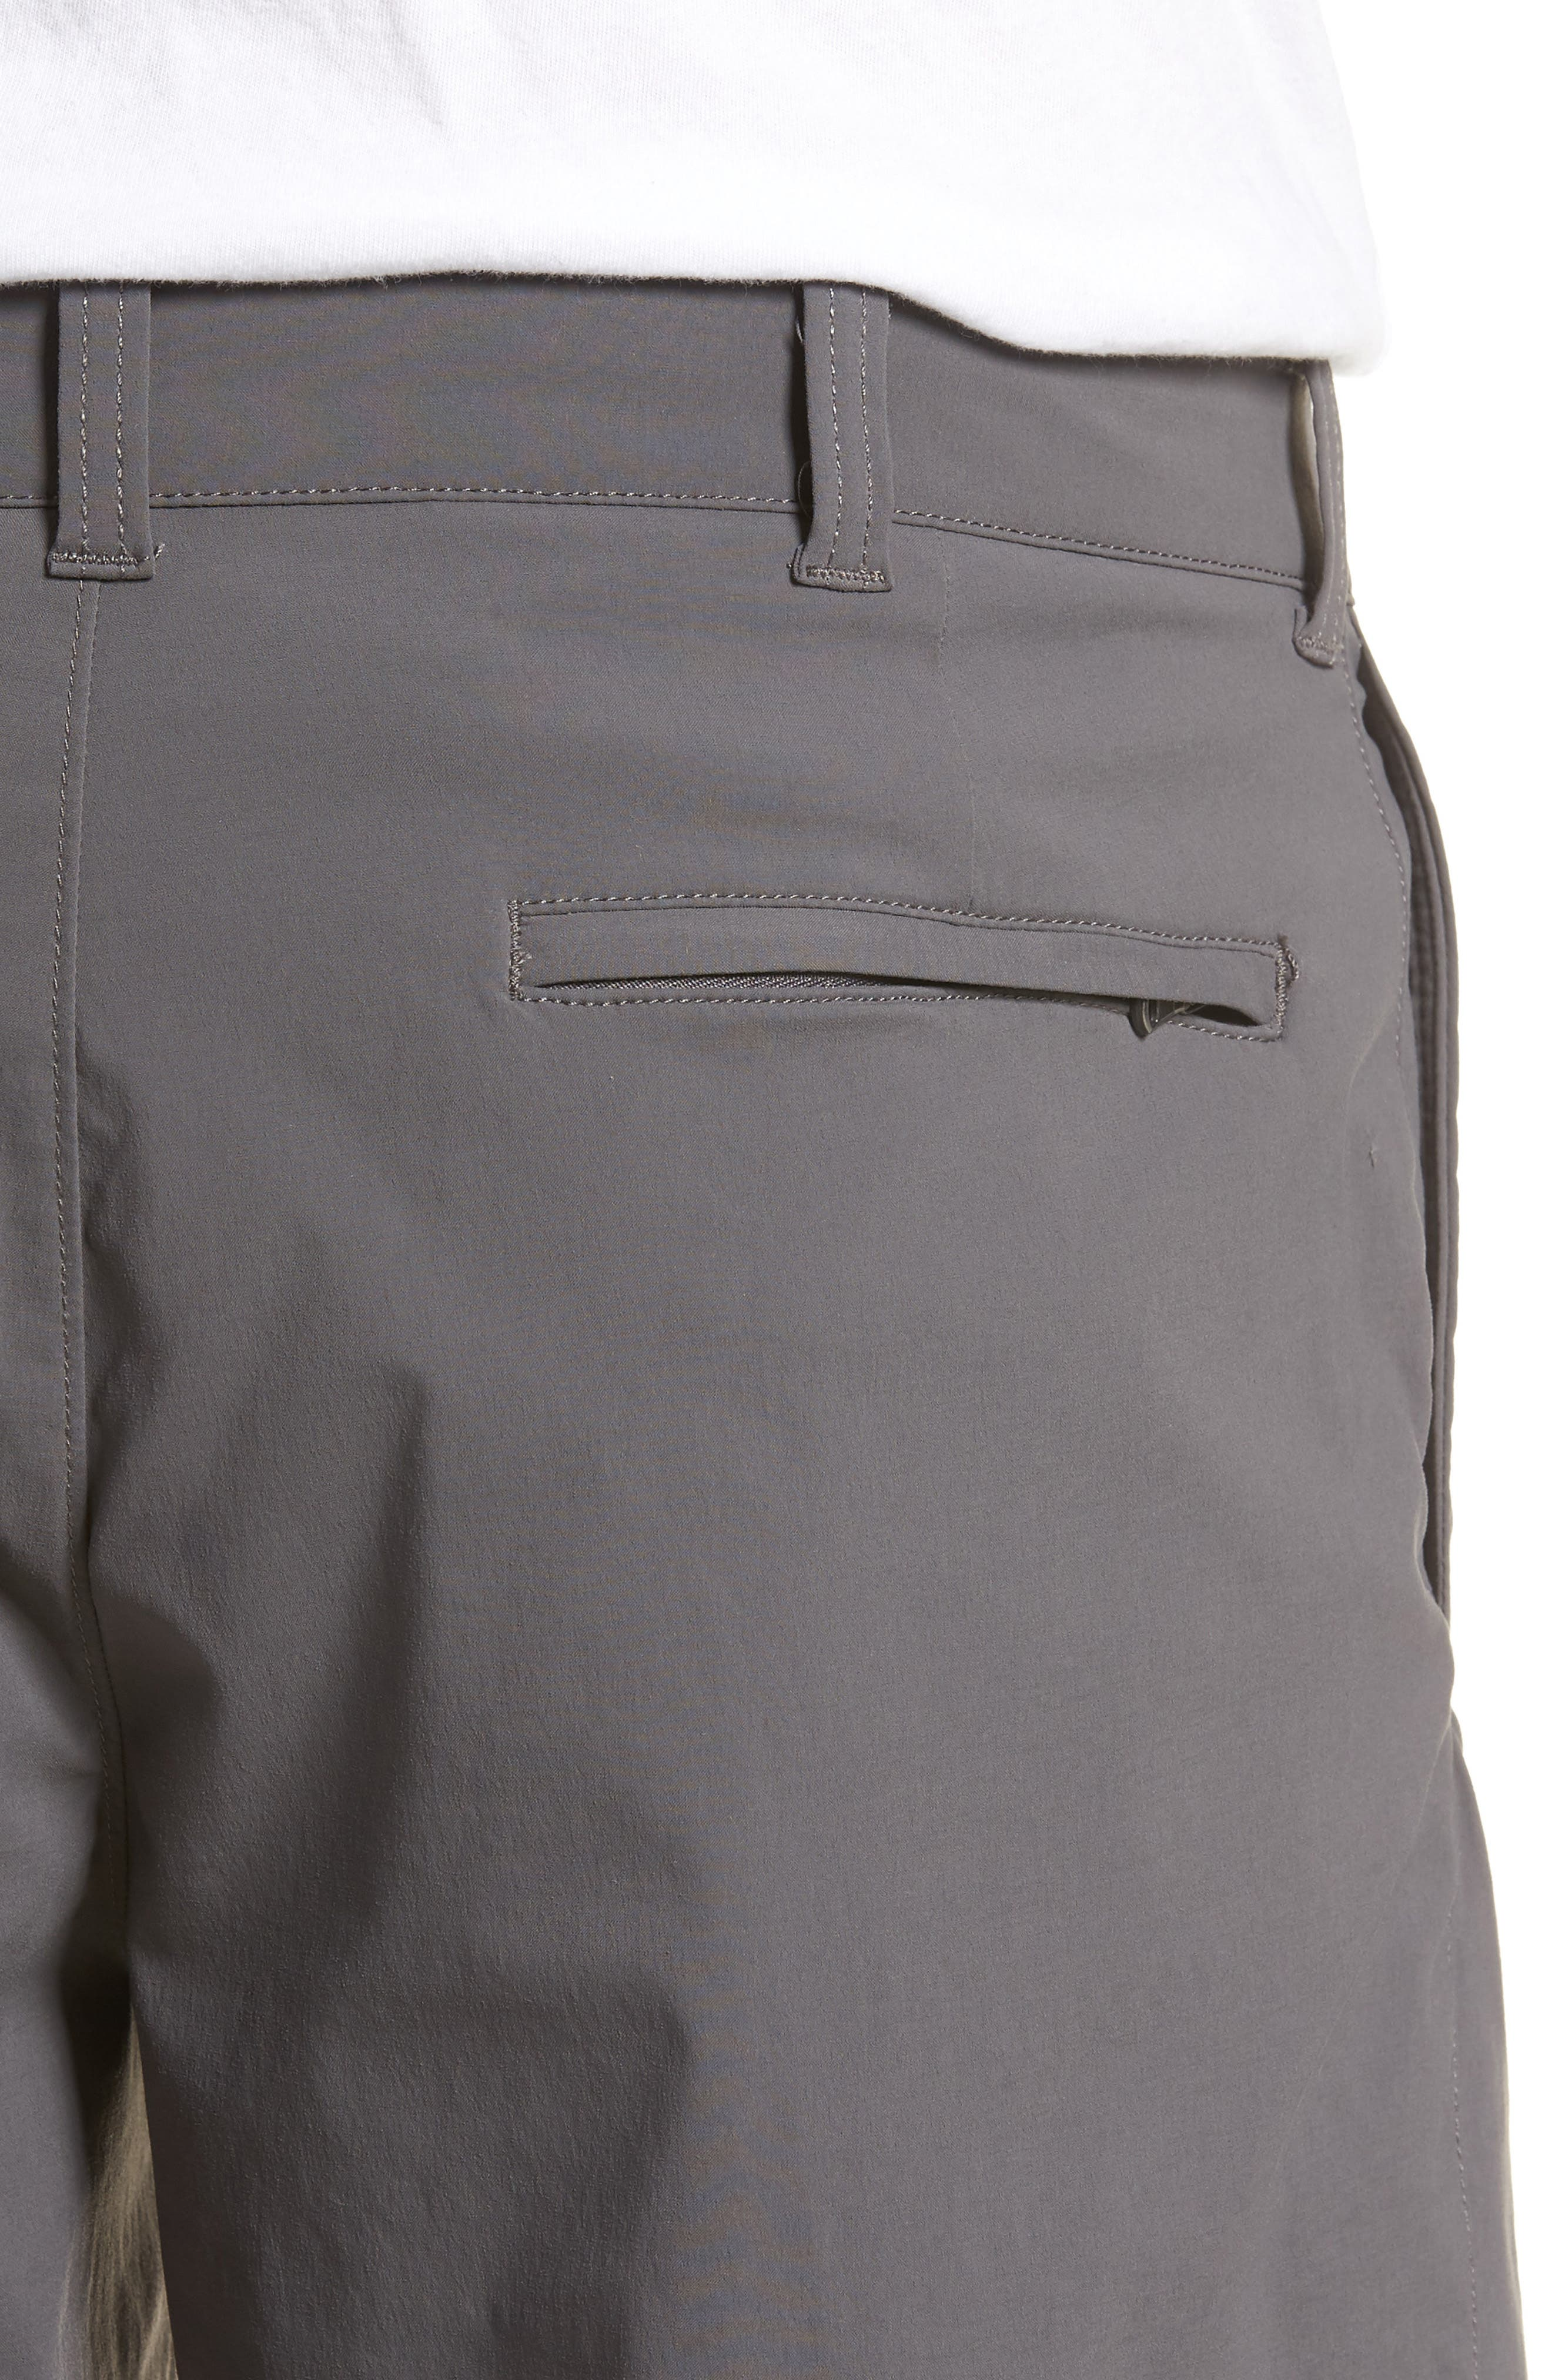 Tech Shorts,                             Alternate thumbnail 4, color,                             020